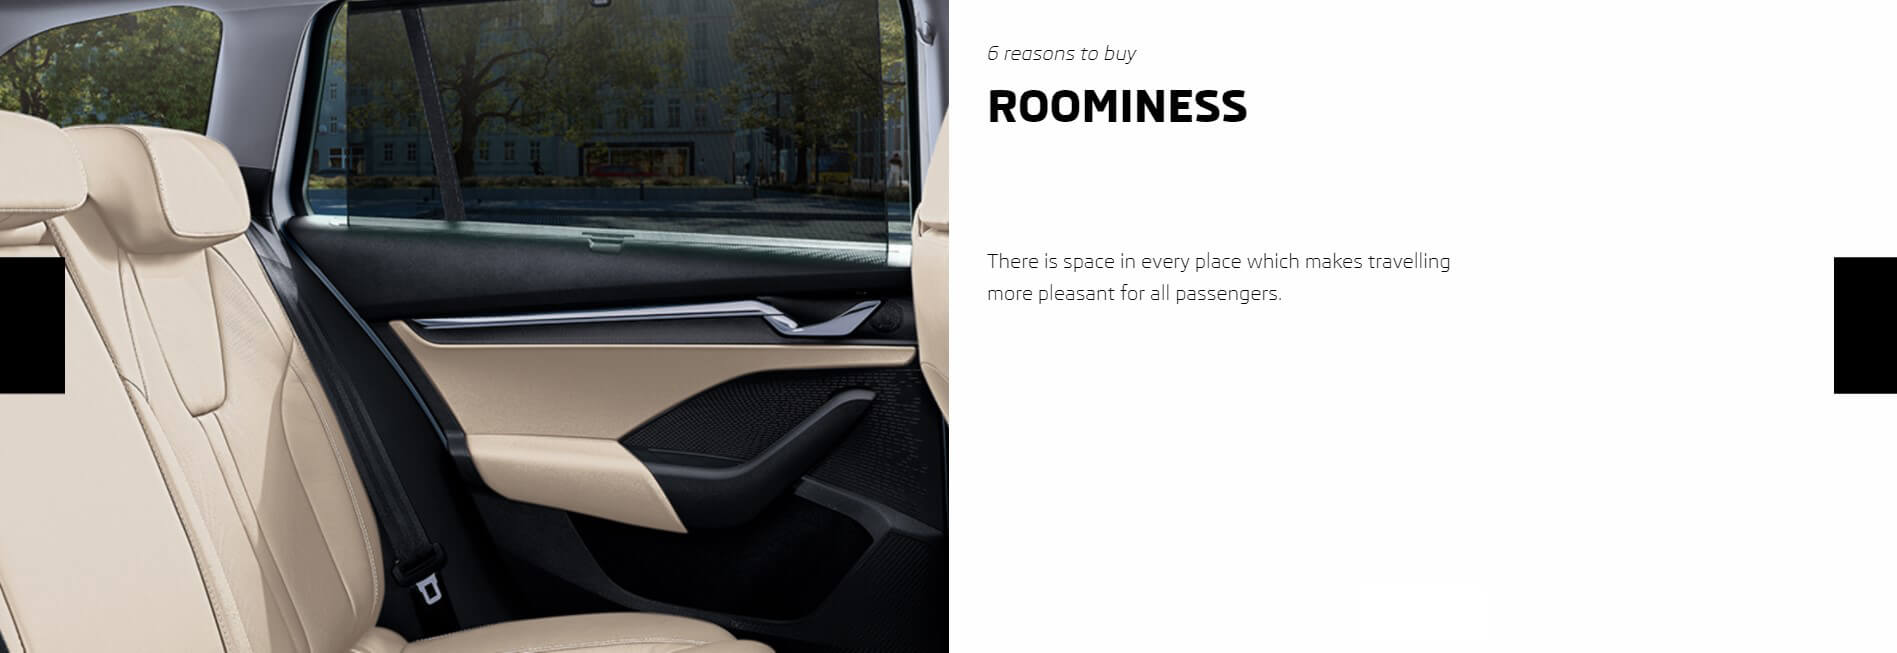 6 Reasons To Buy Octavia roomiess